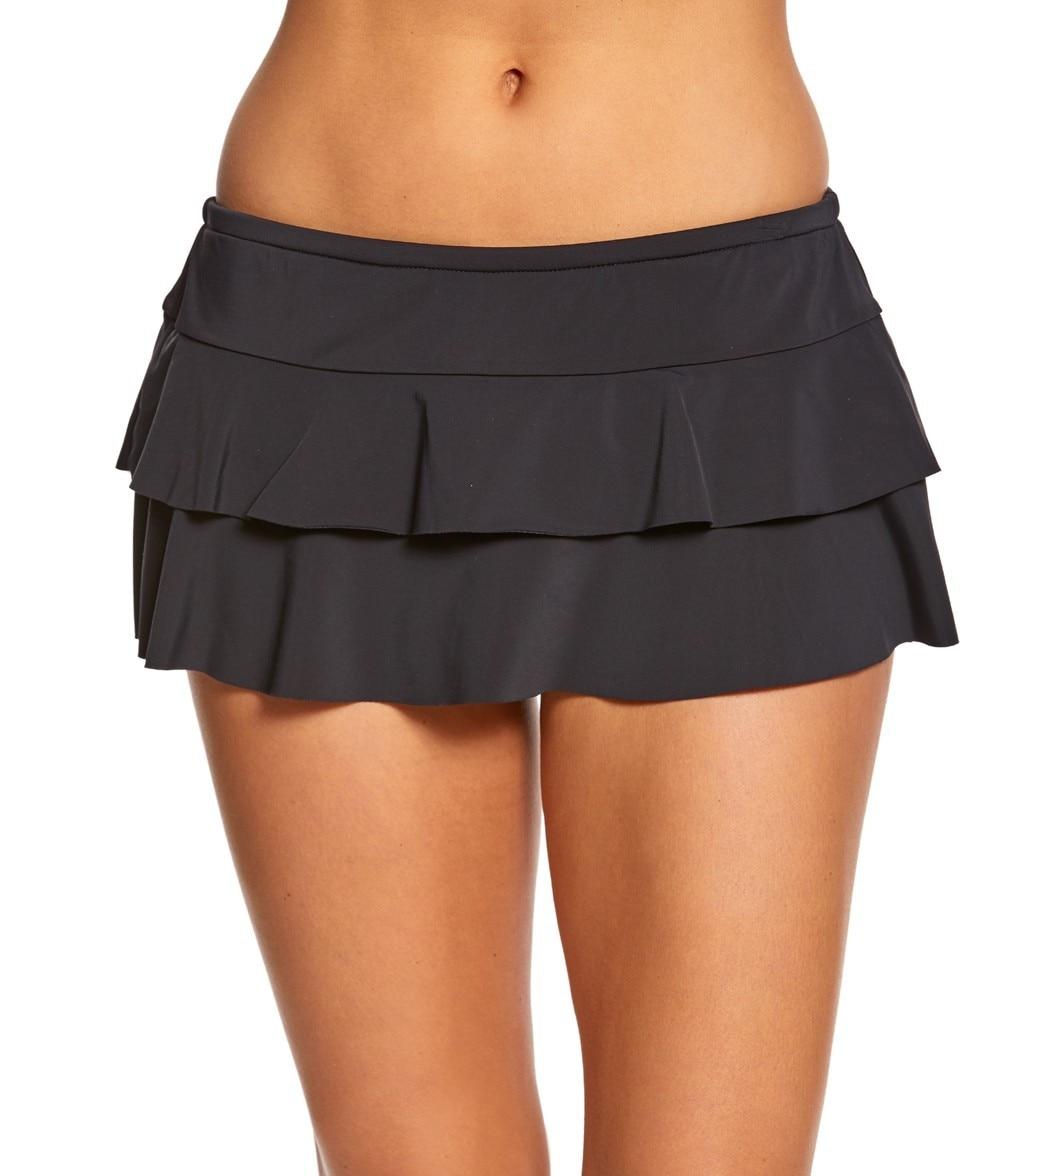 Amazon Fashion Double Layer Flounced Swimdress Beach Skirt Lining Swimming Trunks Short Skirt Bathing Suit